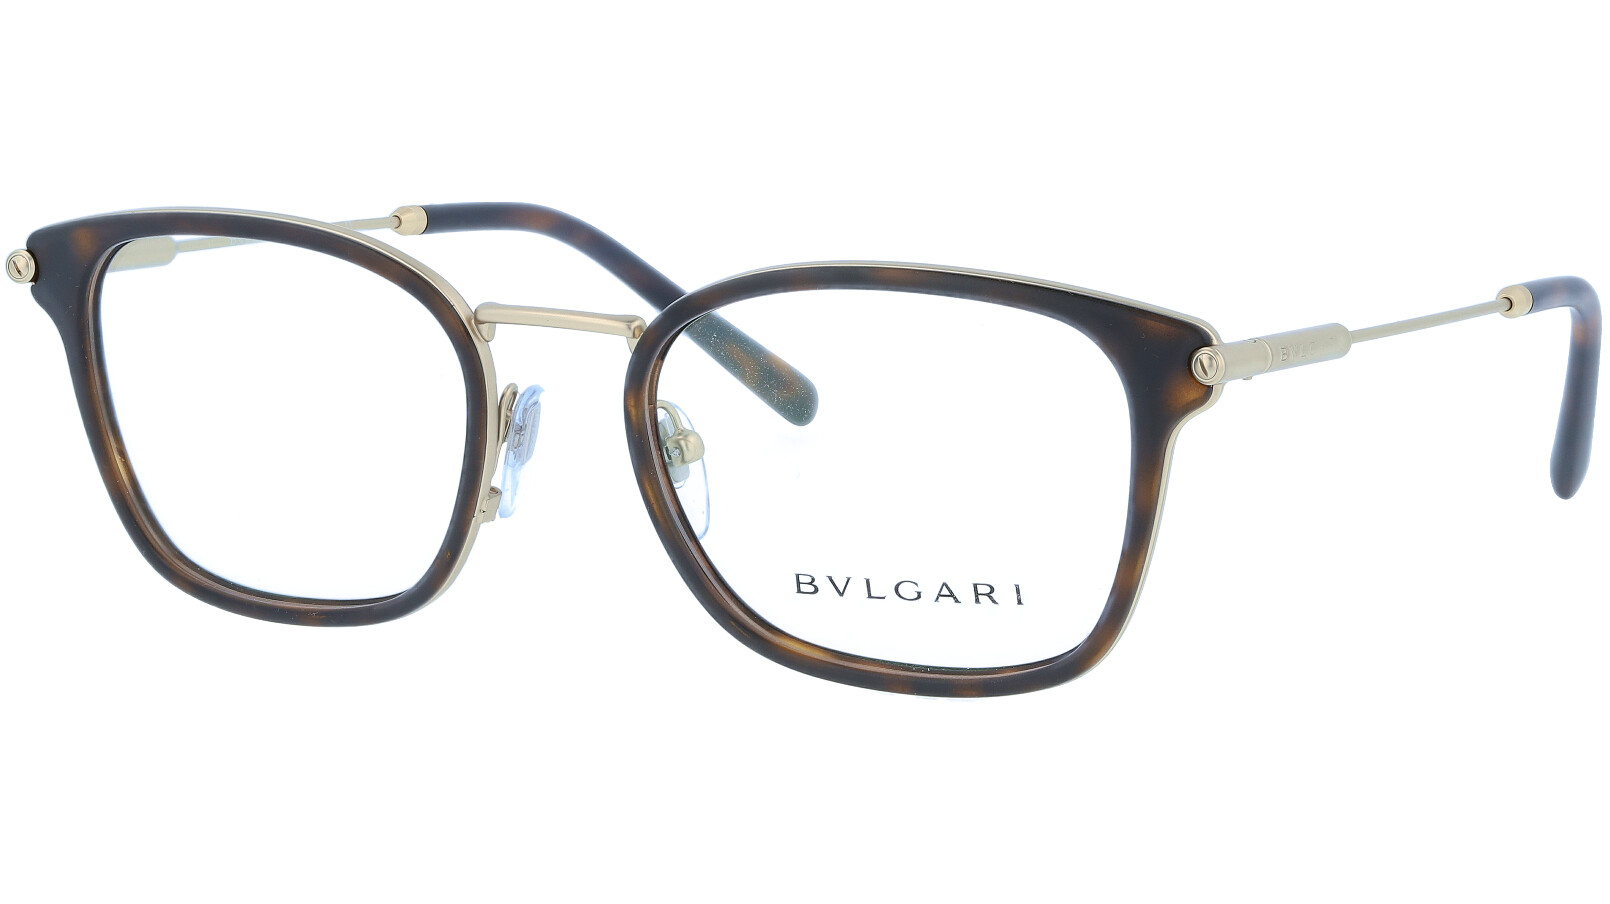 BVLGARI BV1095 2022 53 HAVANA Glasses